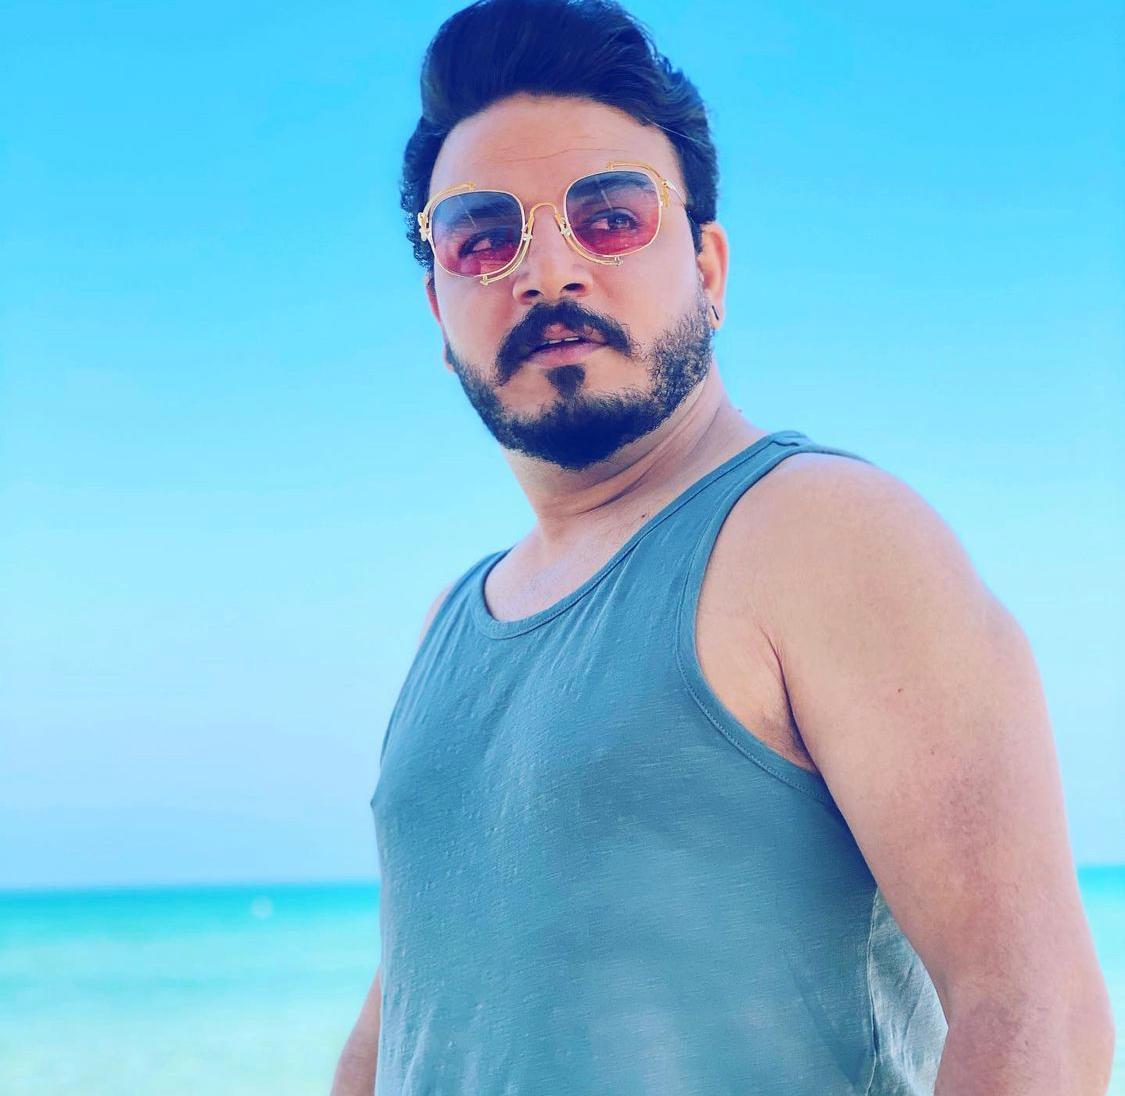 Meet Dubai's versatile, creative and talented entertainer — RJ Vikrant